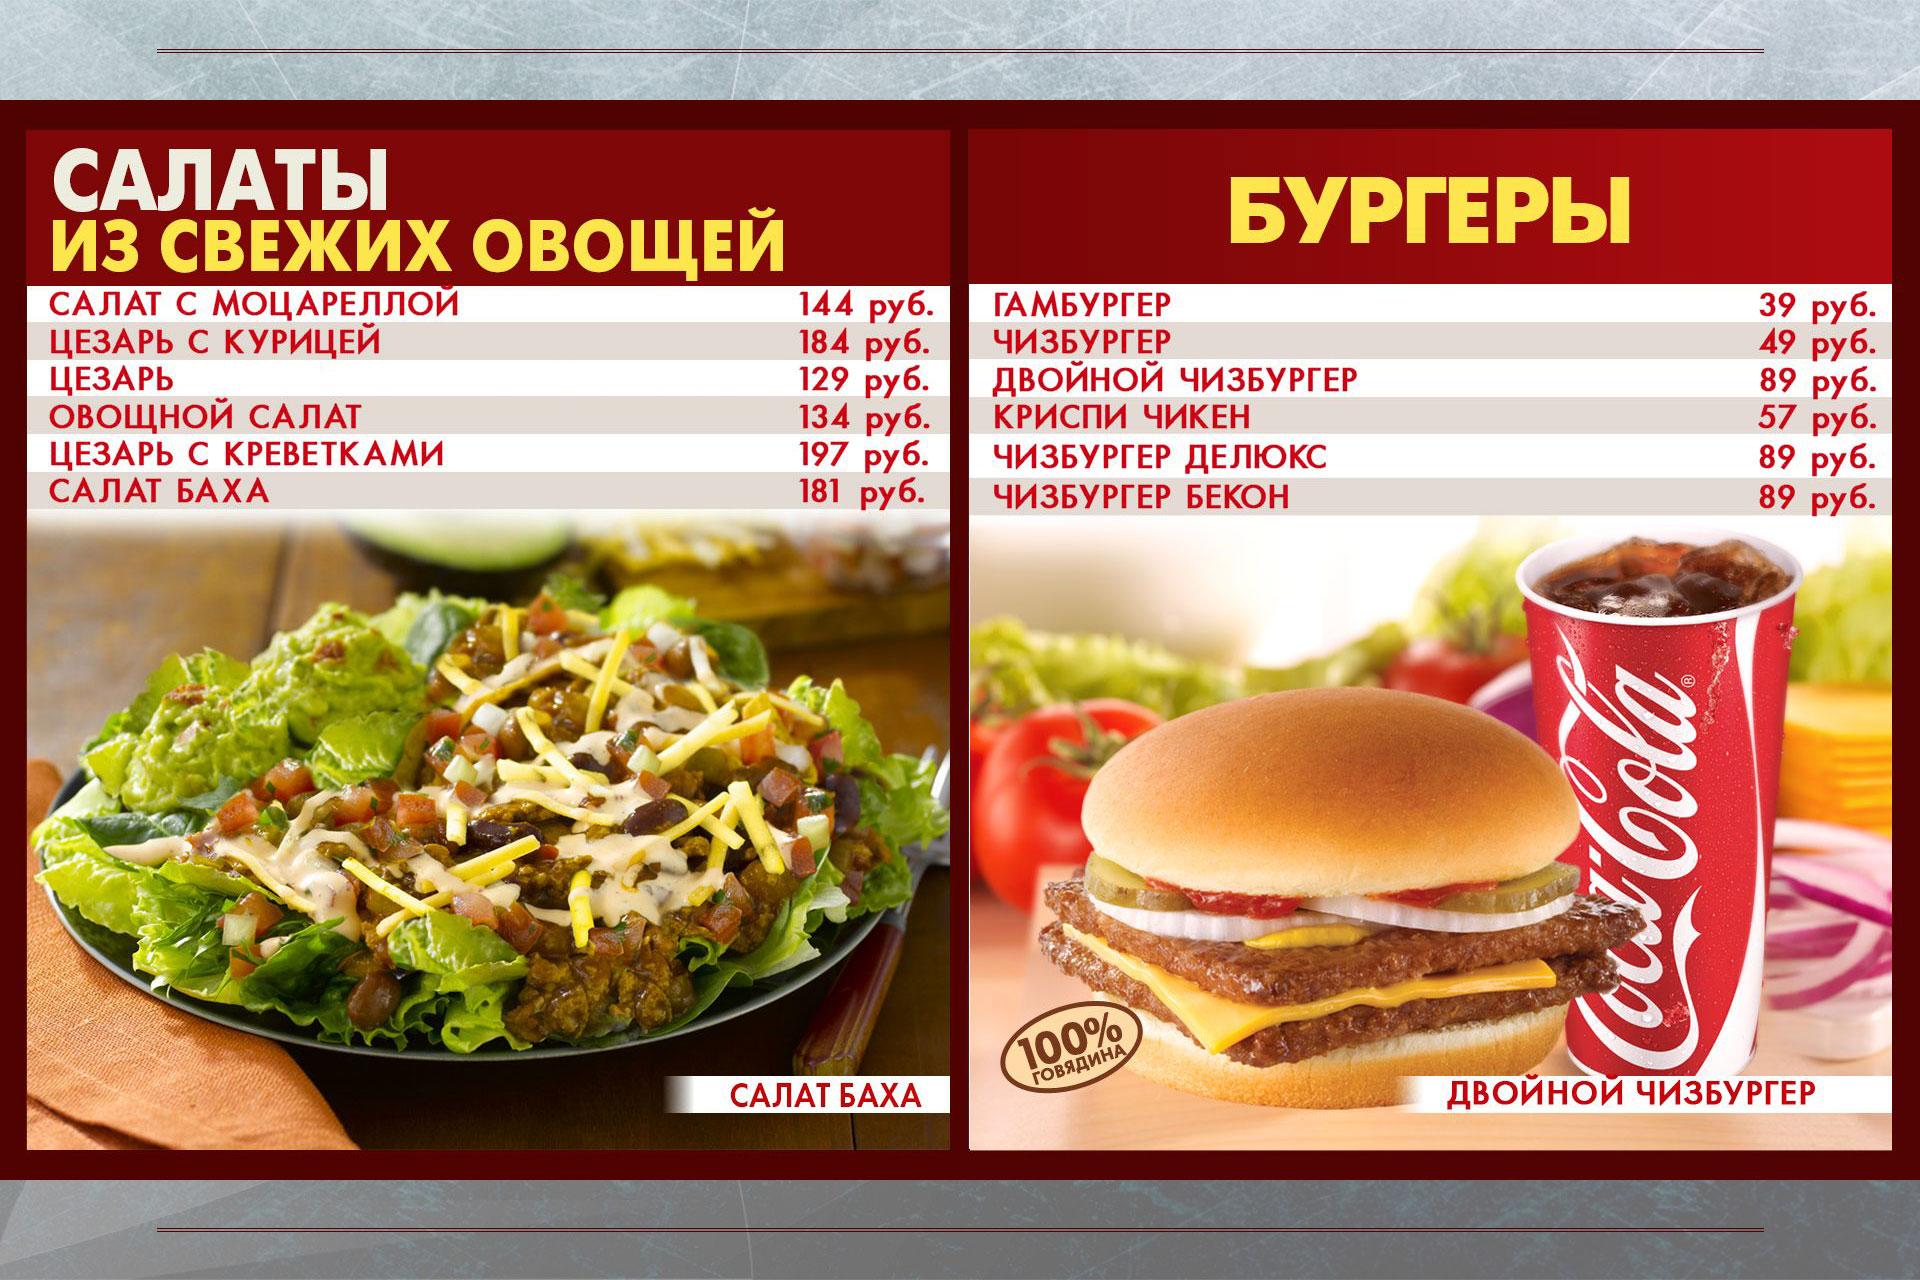 Burgers-20111101.jpg